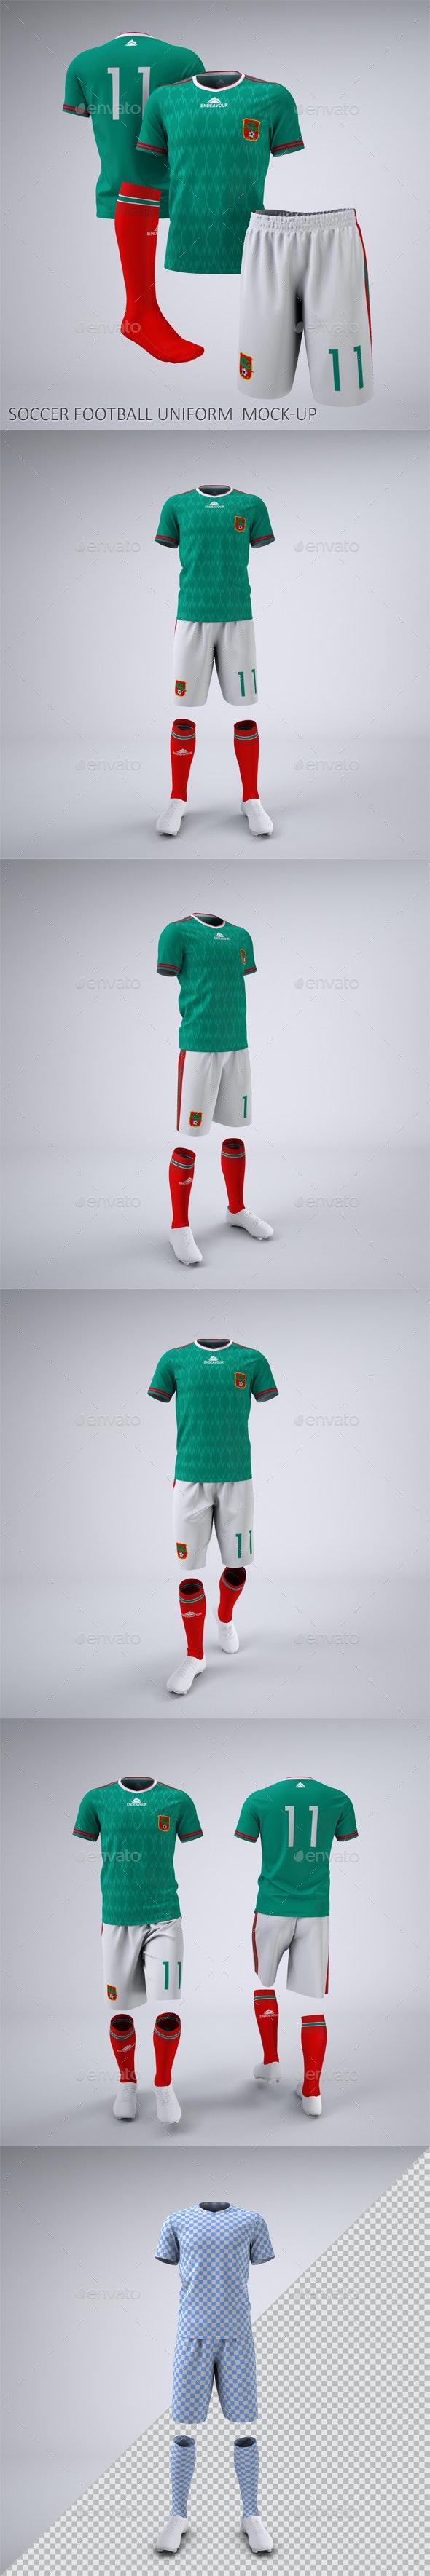 Soccer Football Team Uniform Mock-Up - Miscellaneous Apparel